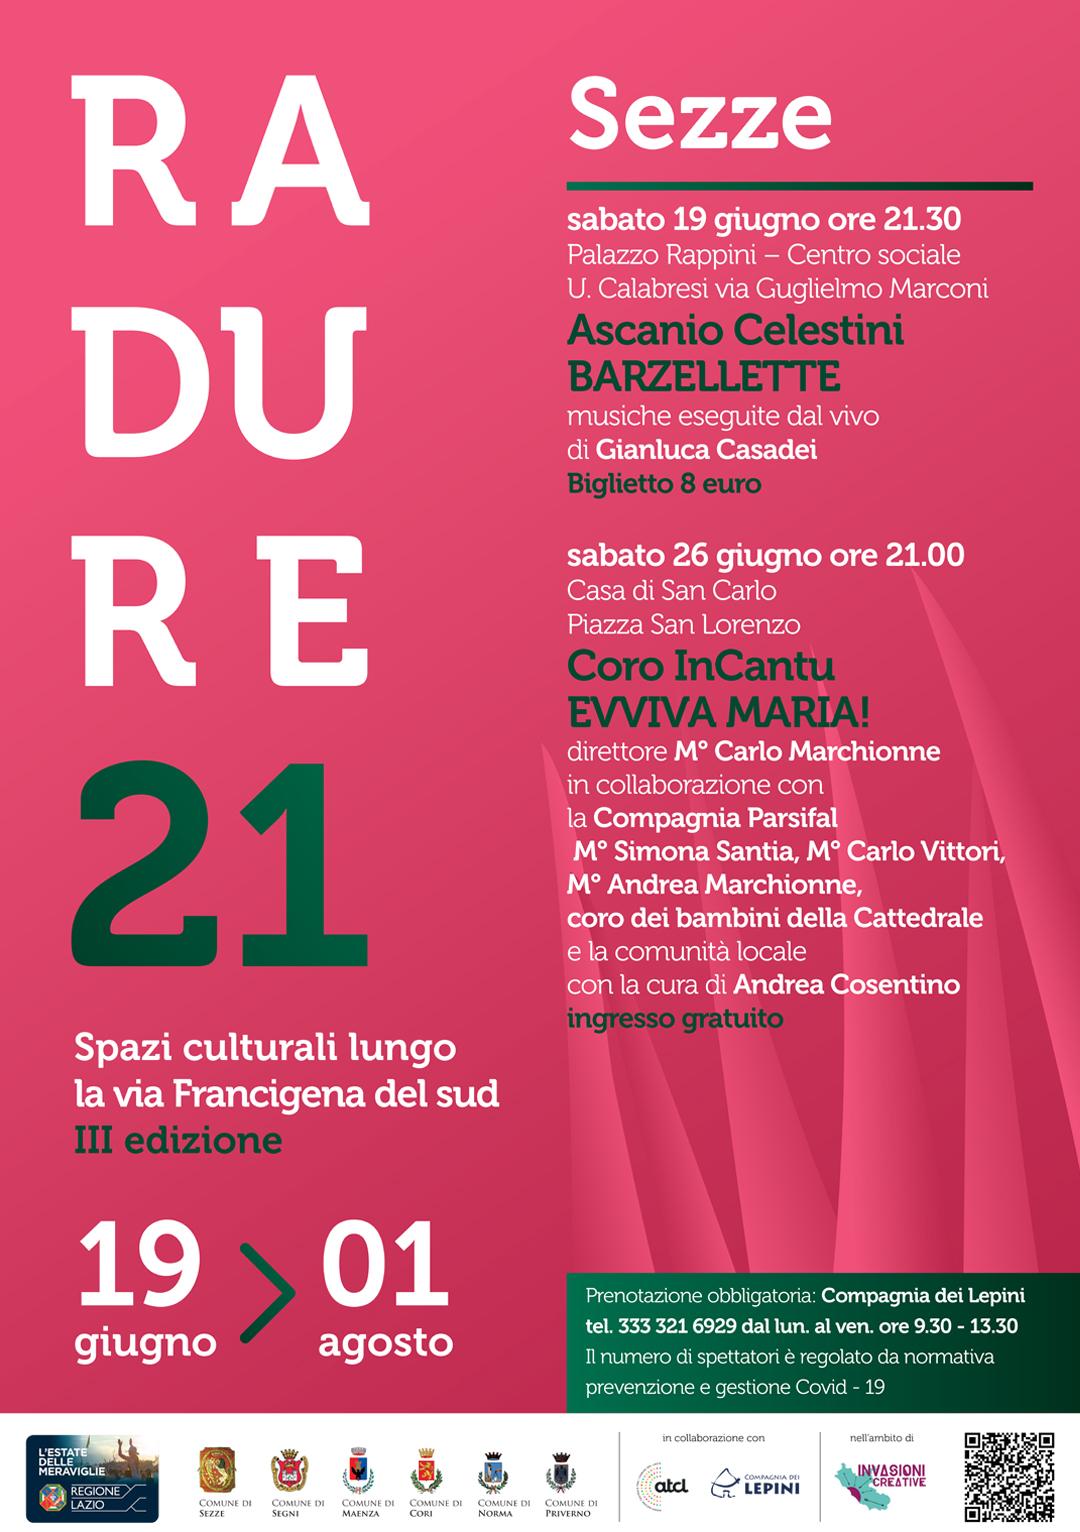 Radure 2021 Sezze: Evviva Maria! @ Casa di San Carlo – piazza San Lorenzo